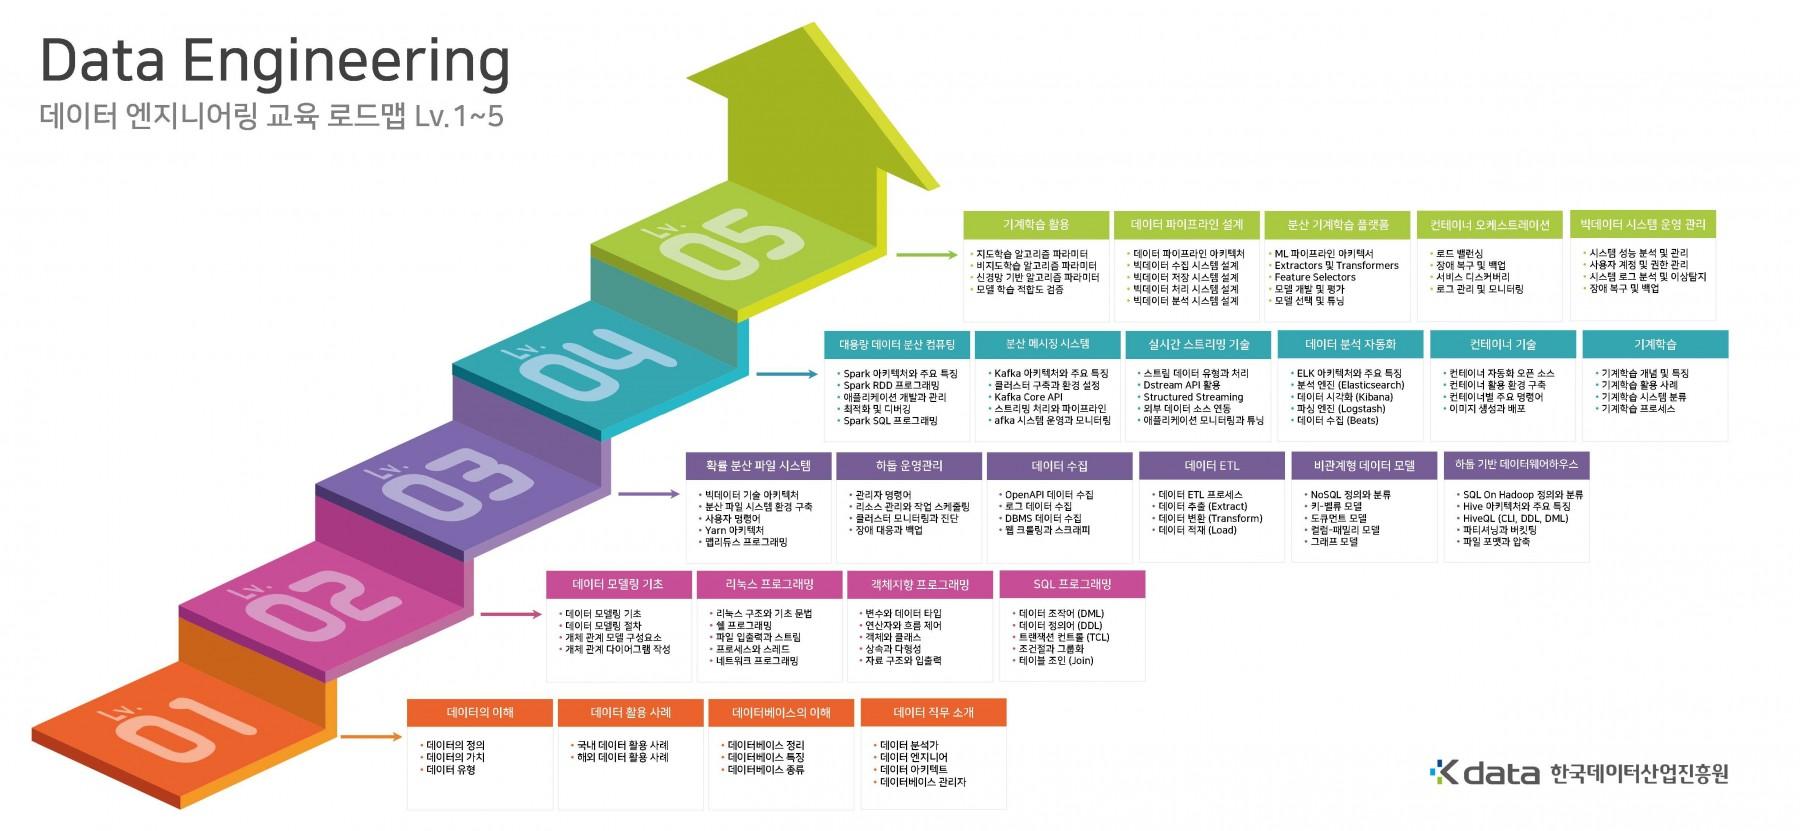 2. DATA Engineering 로드맵